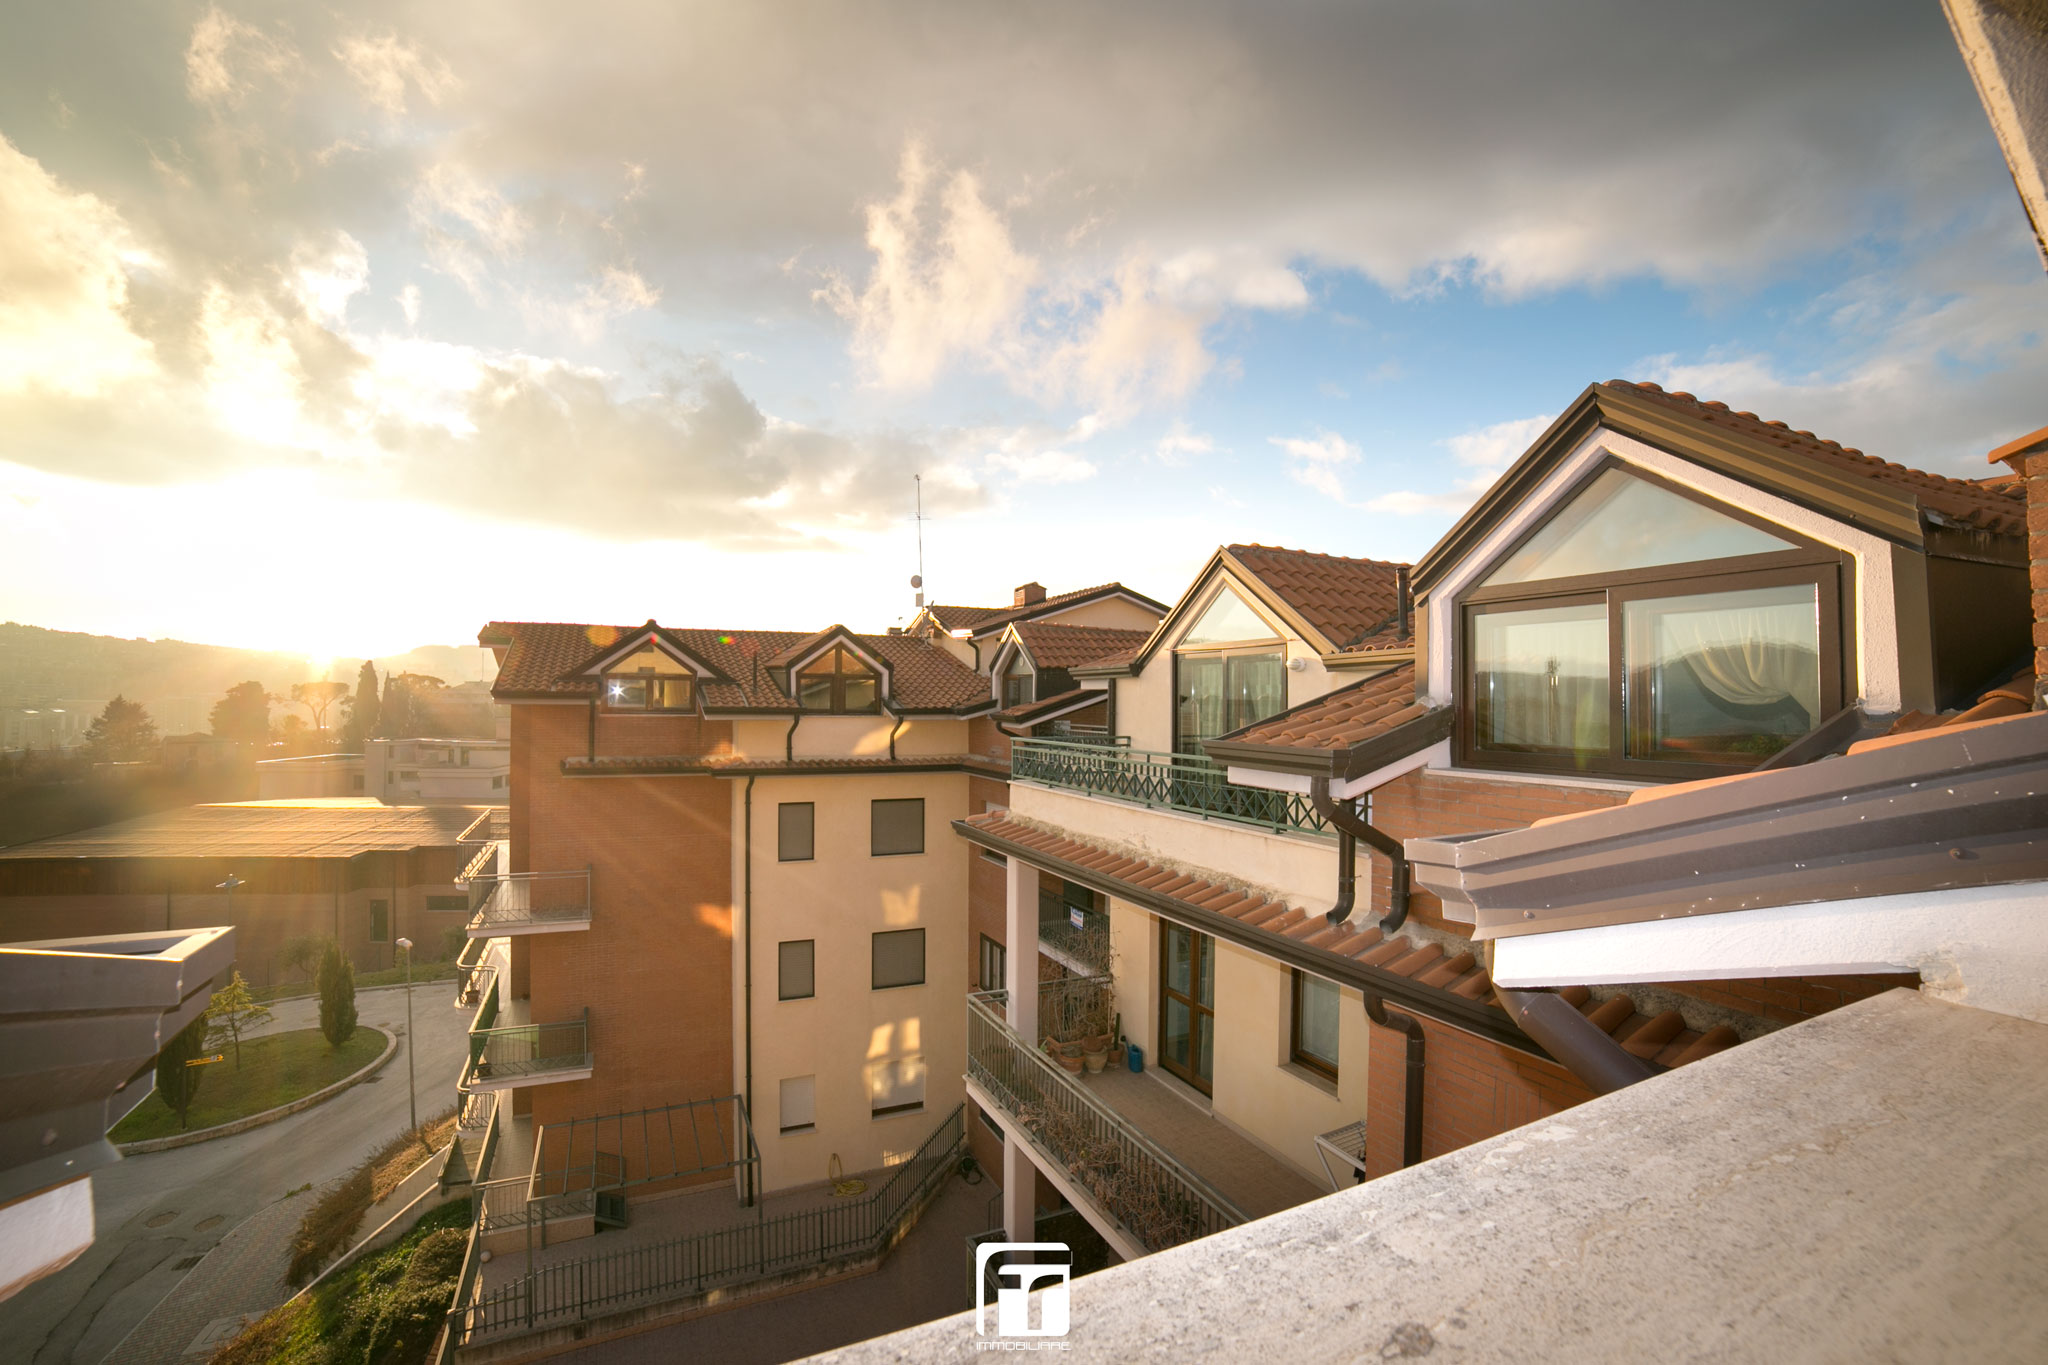 608a7815 fr immobiliare for Bacheca affitti